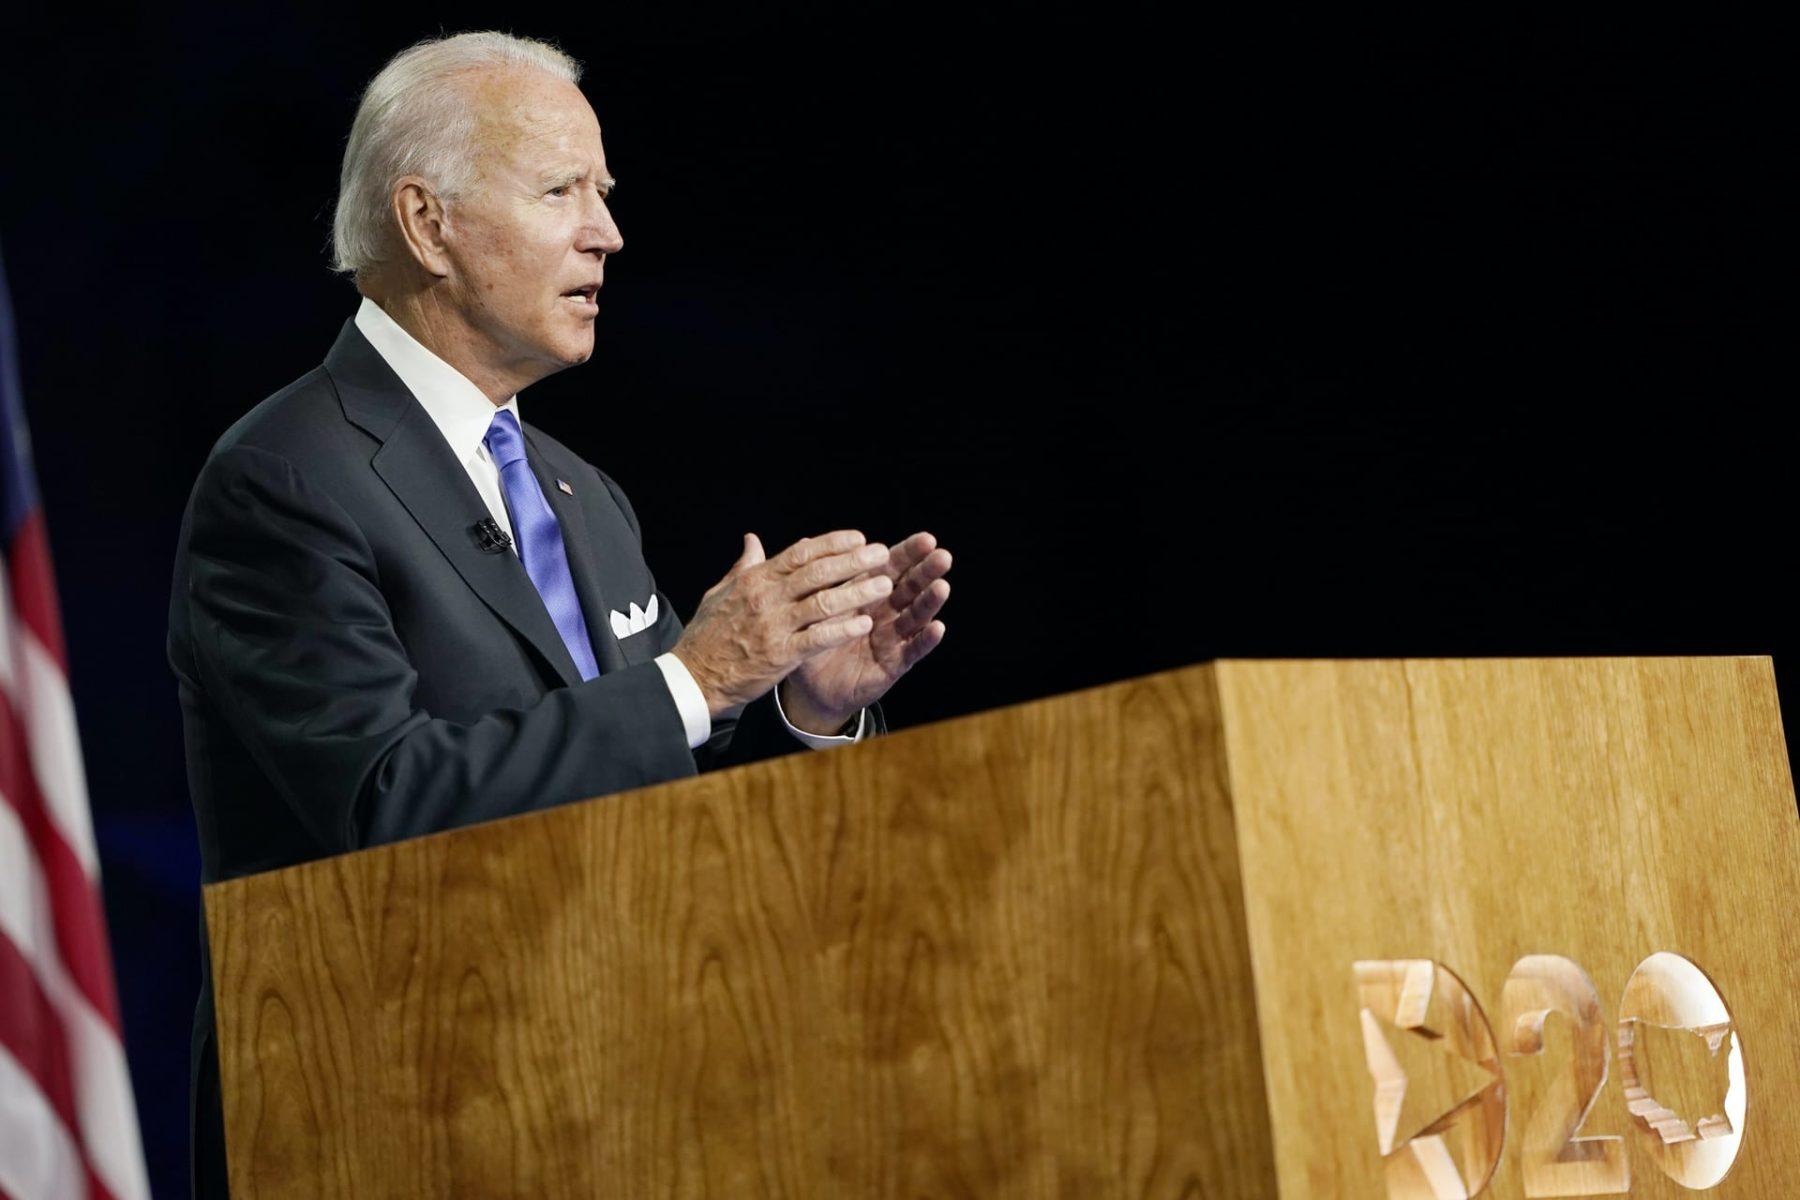 Joe Biden stands at a lecturn.